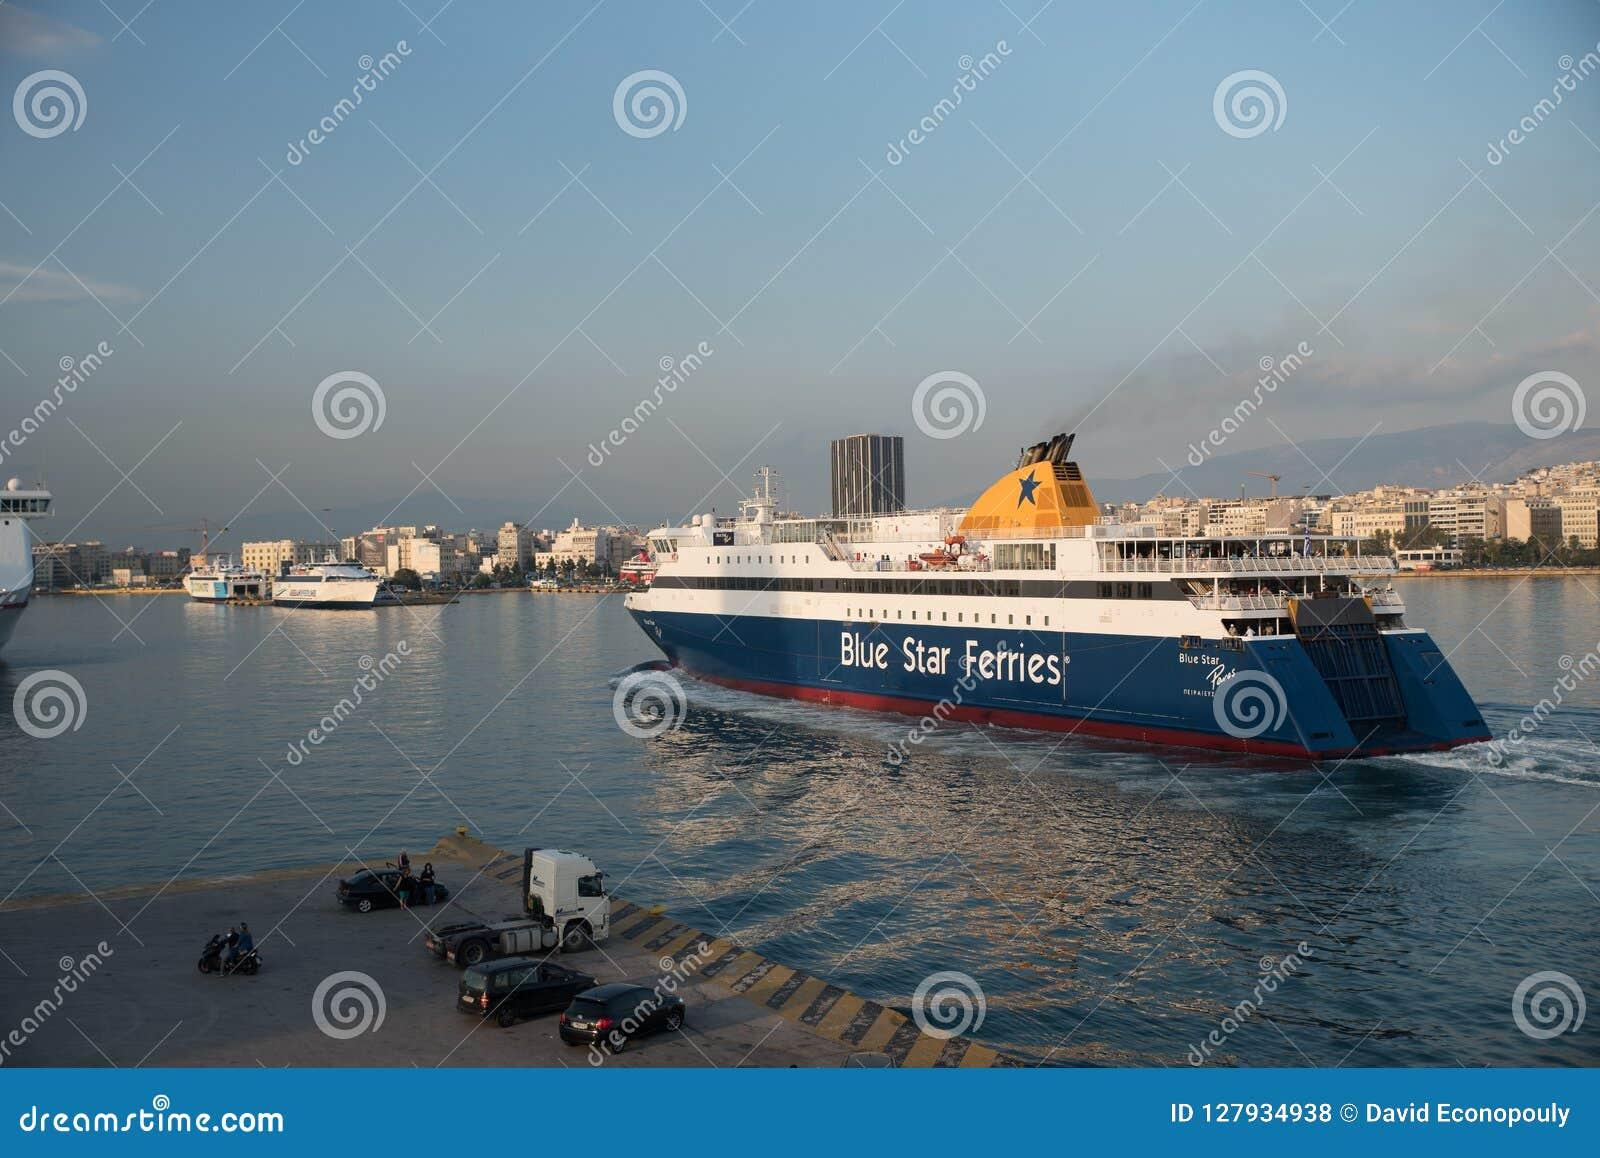 Pireaus Greece/ June 18, 2018: Ferry arriving in Pireaus Harbor Greece